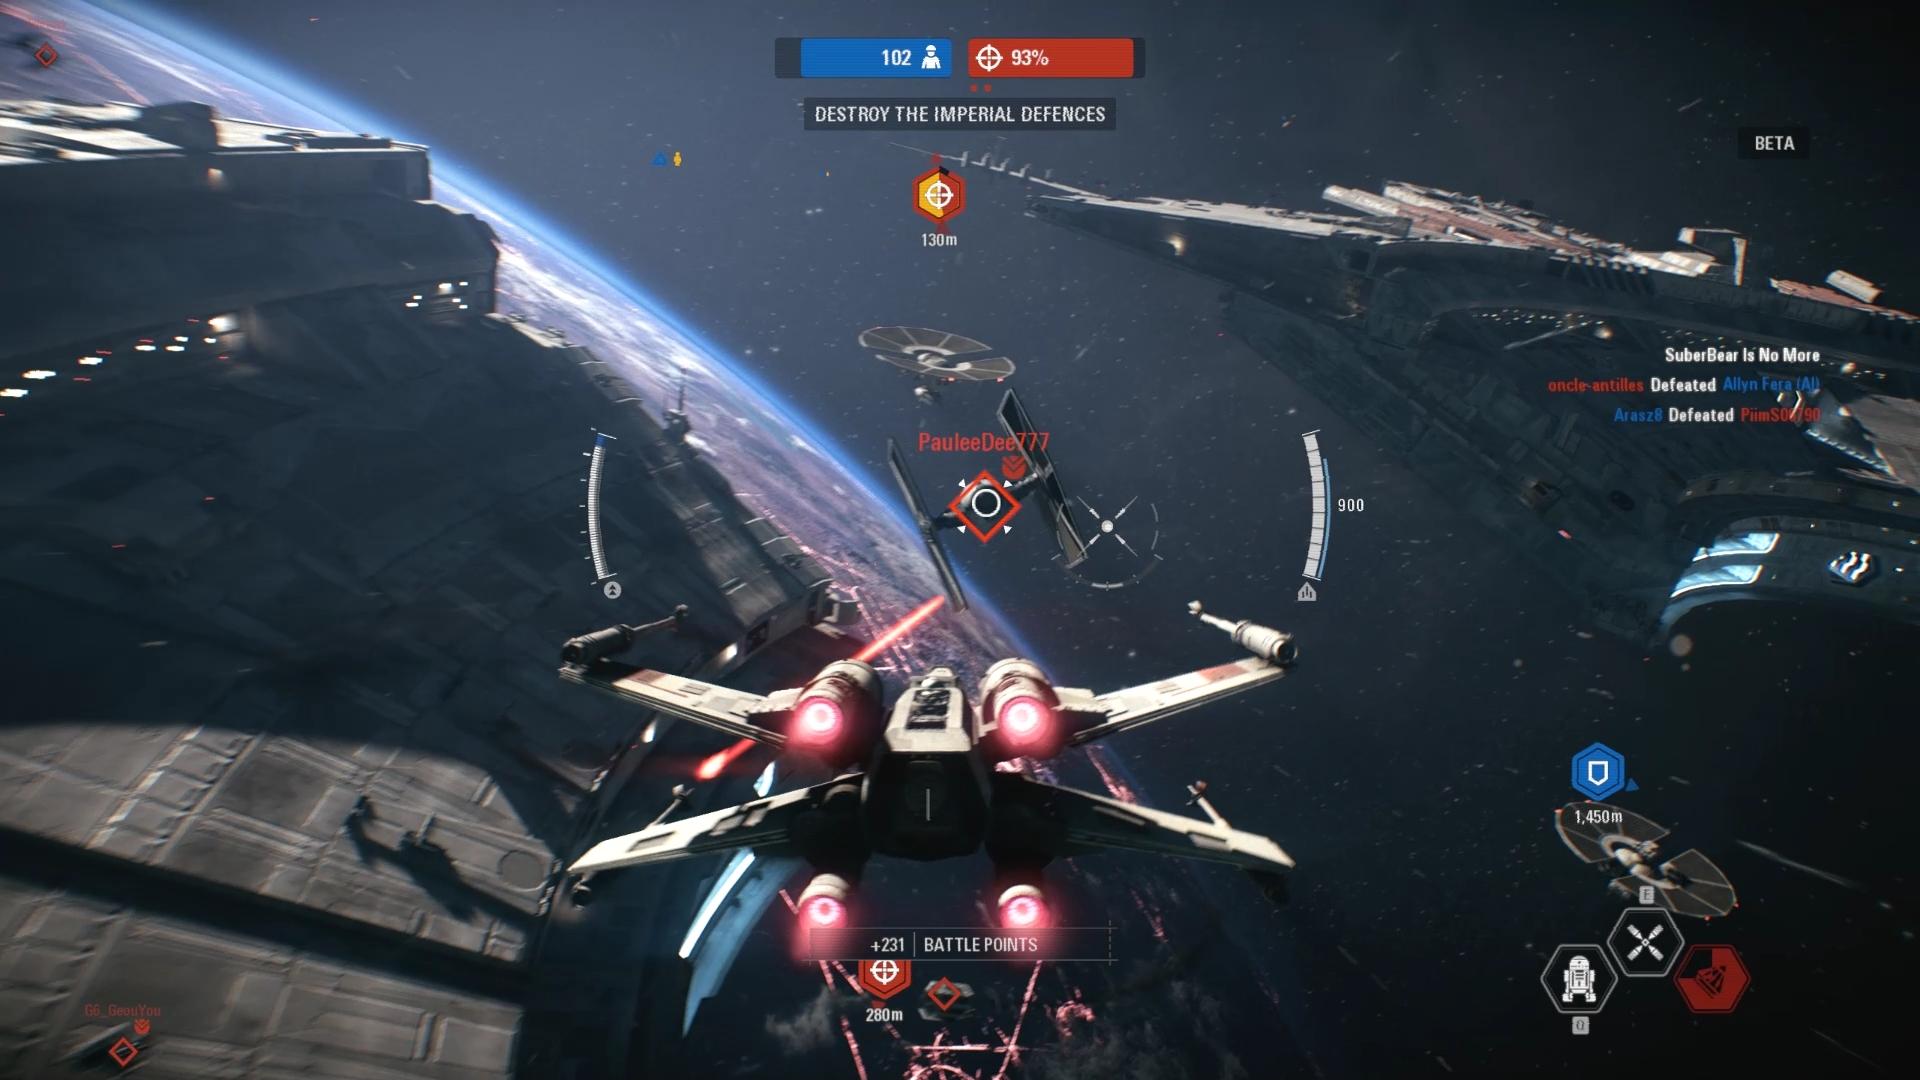 Battlefront-2 X-wing fondor